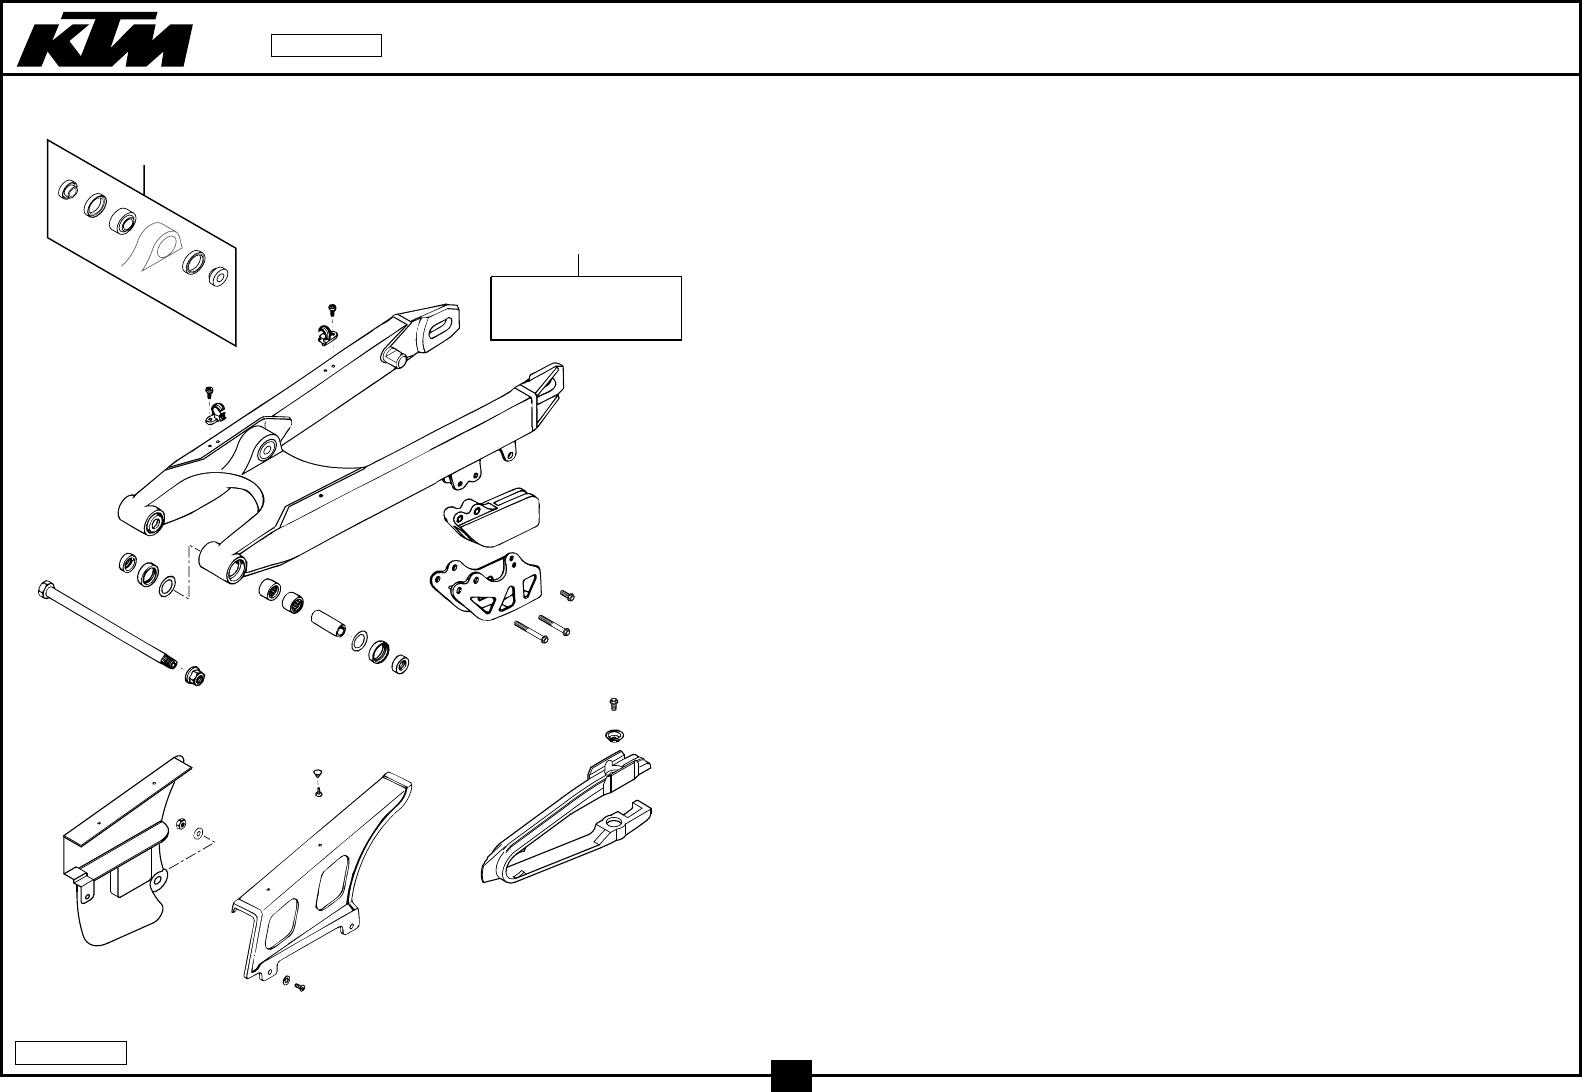 Schwingarm kettenschutz swingarm chain guard 125 380 '99